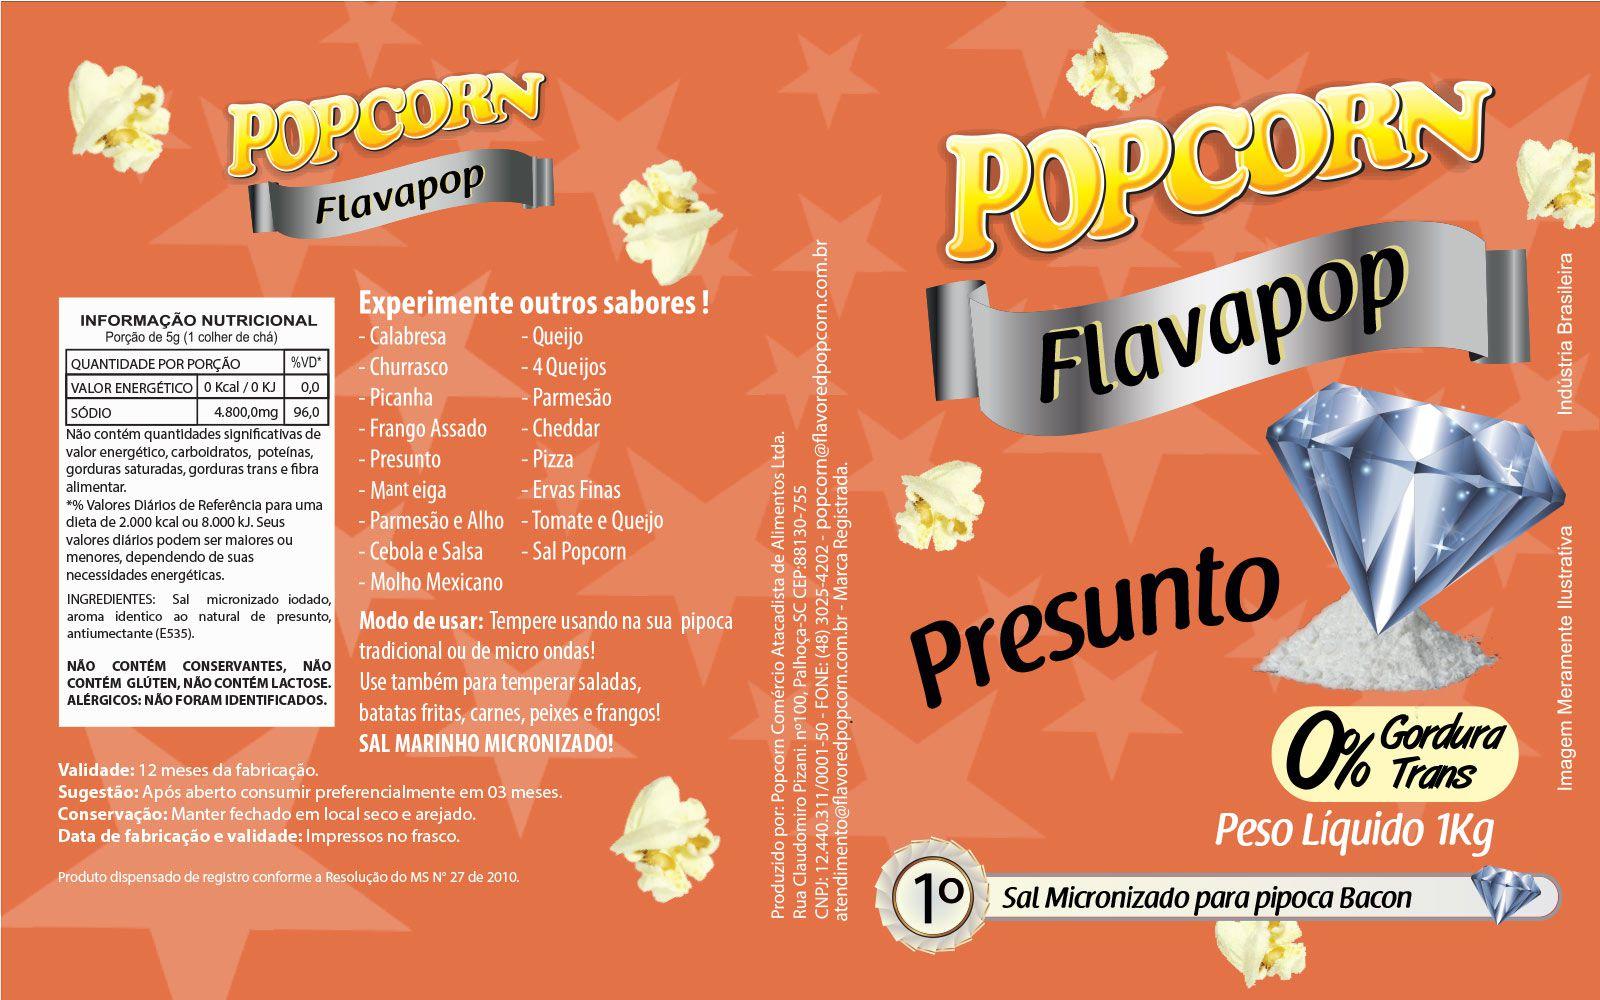 FLAVAPOP - Original de cinema -  Presunto - Micronizado Popcorn  - Pct 1kg